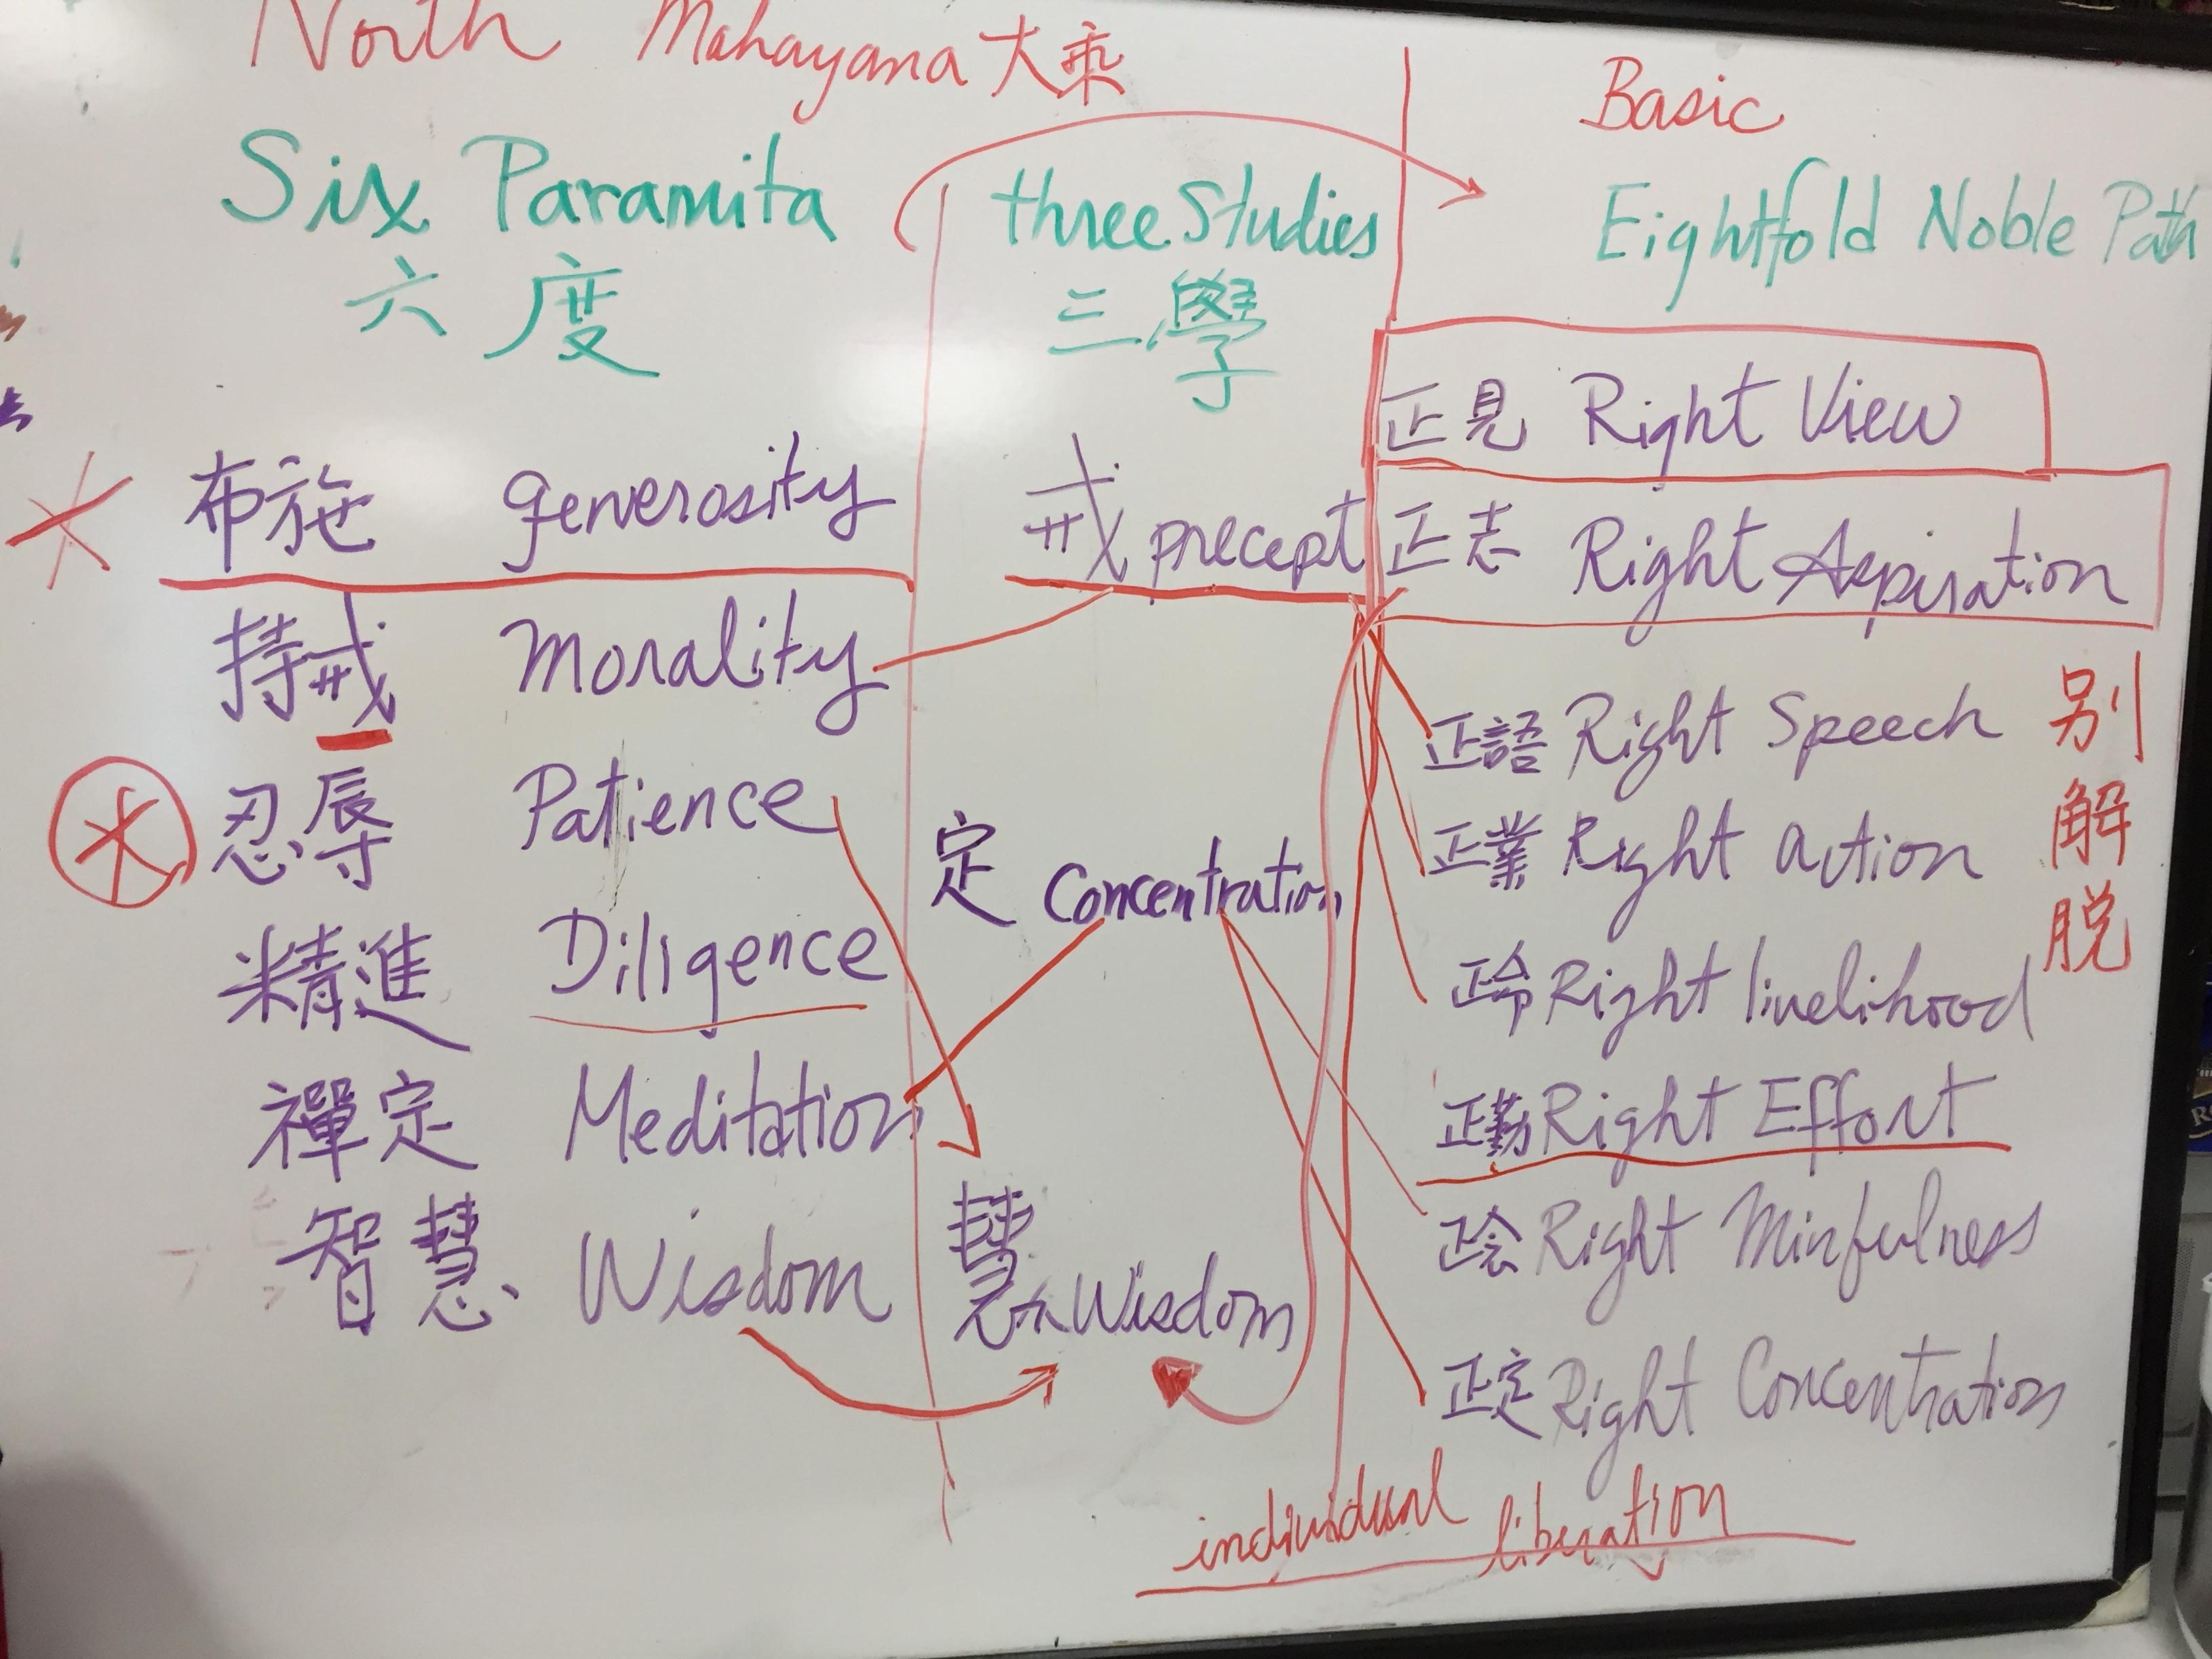 Iris' Notes: comparing The Six Paramitas / Three Studies / Eightfold Noble Path.